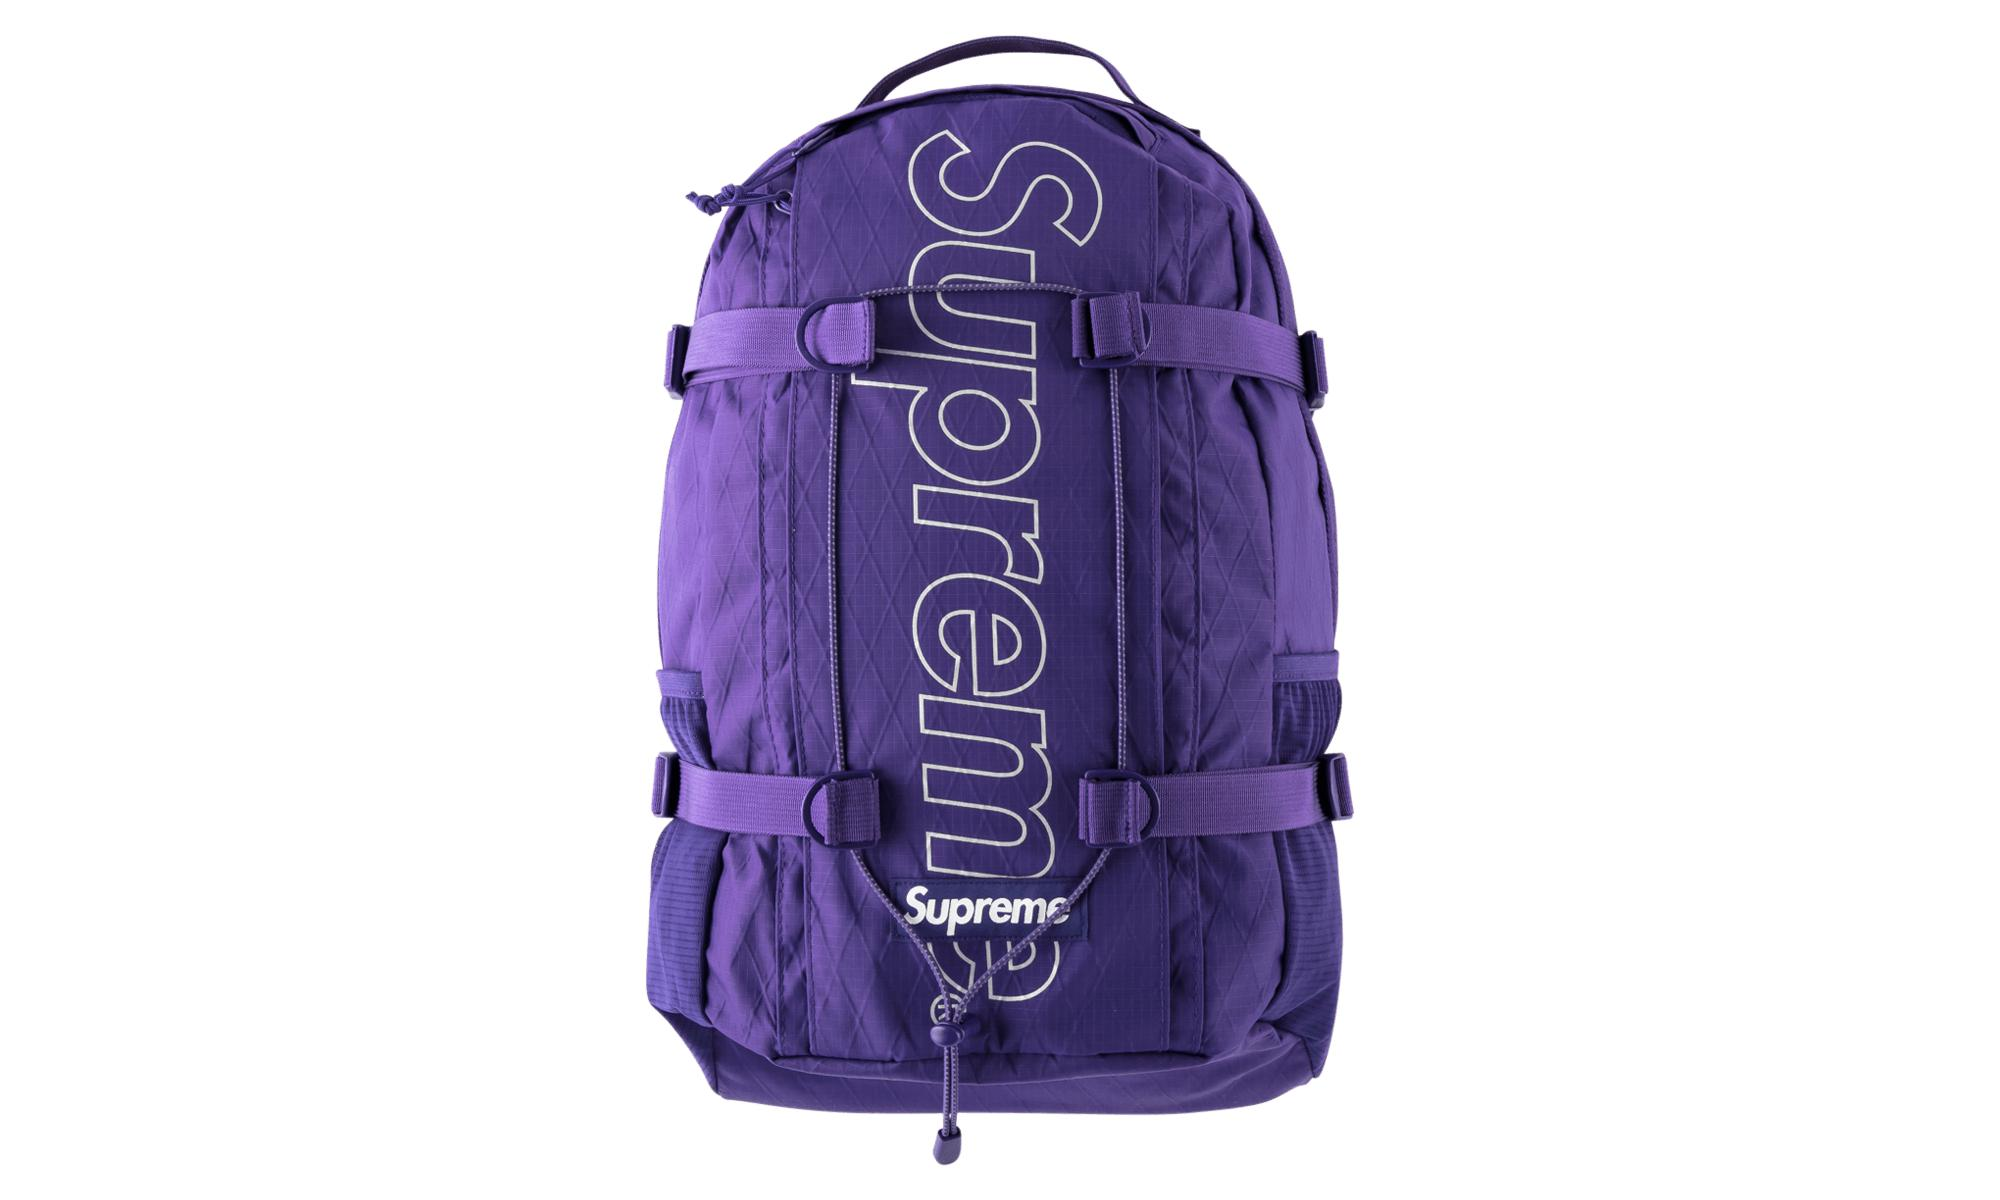 8ba39720e Supreme Purple Backpack 'fw 18' for men